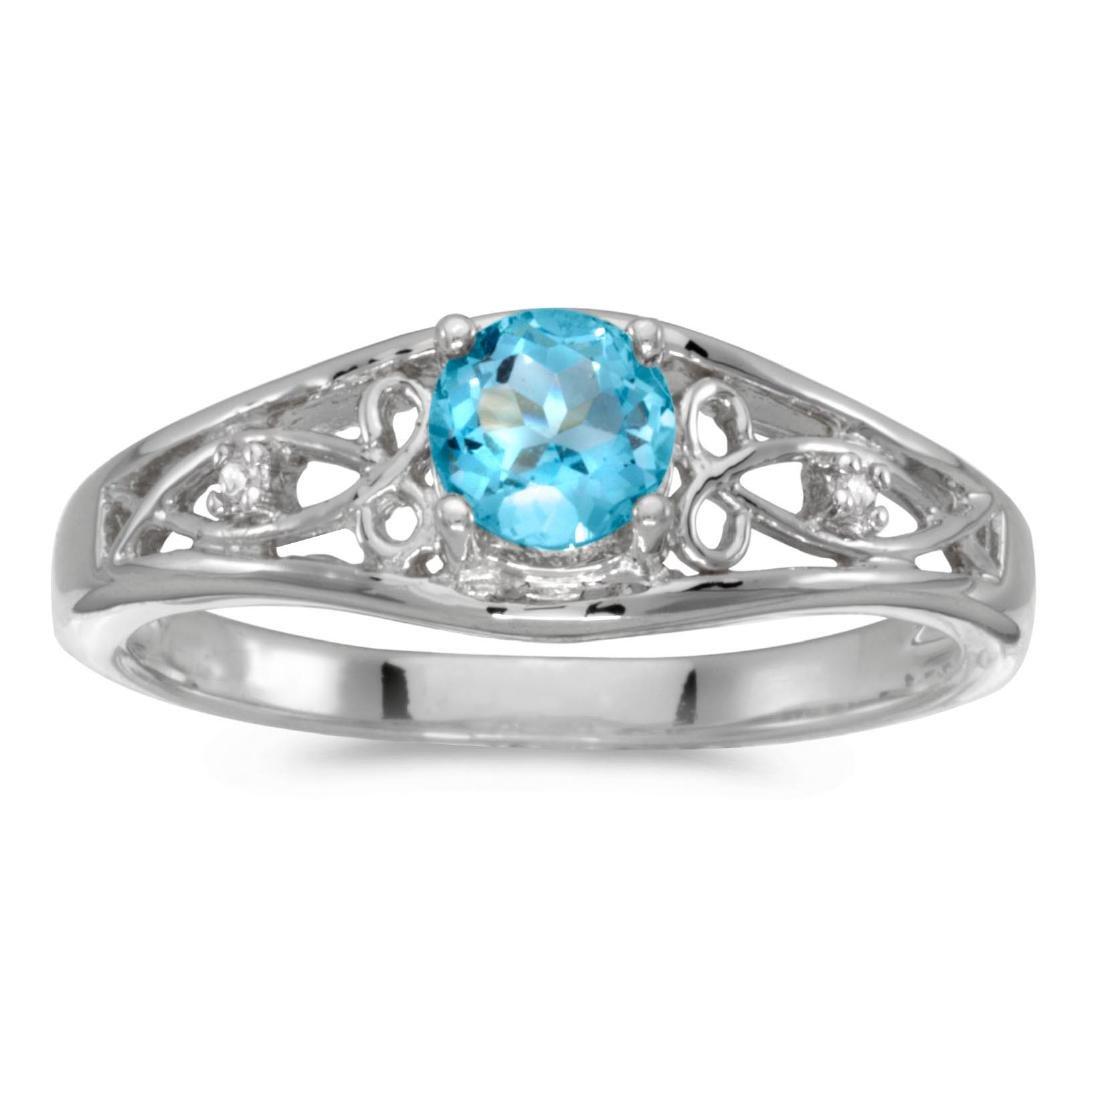 Certified 14k White Gold Round Blue Topaz And Diamond R